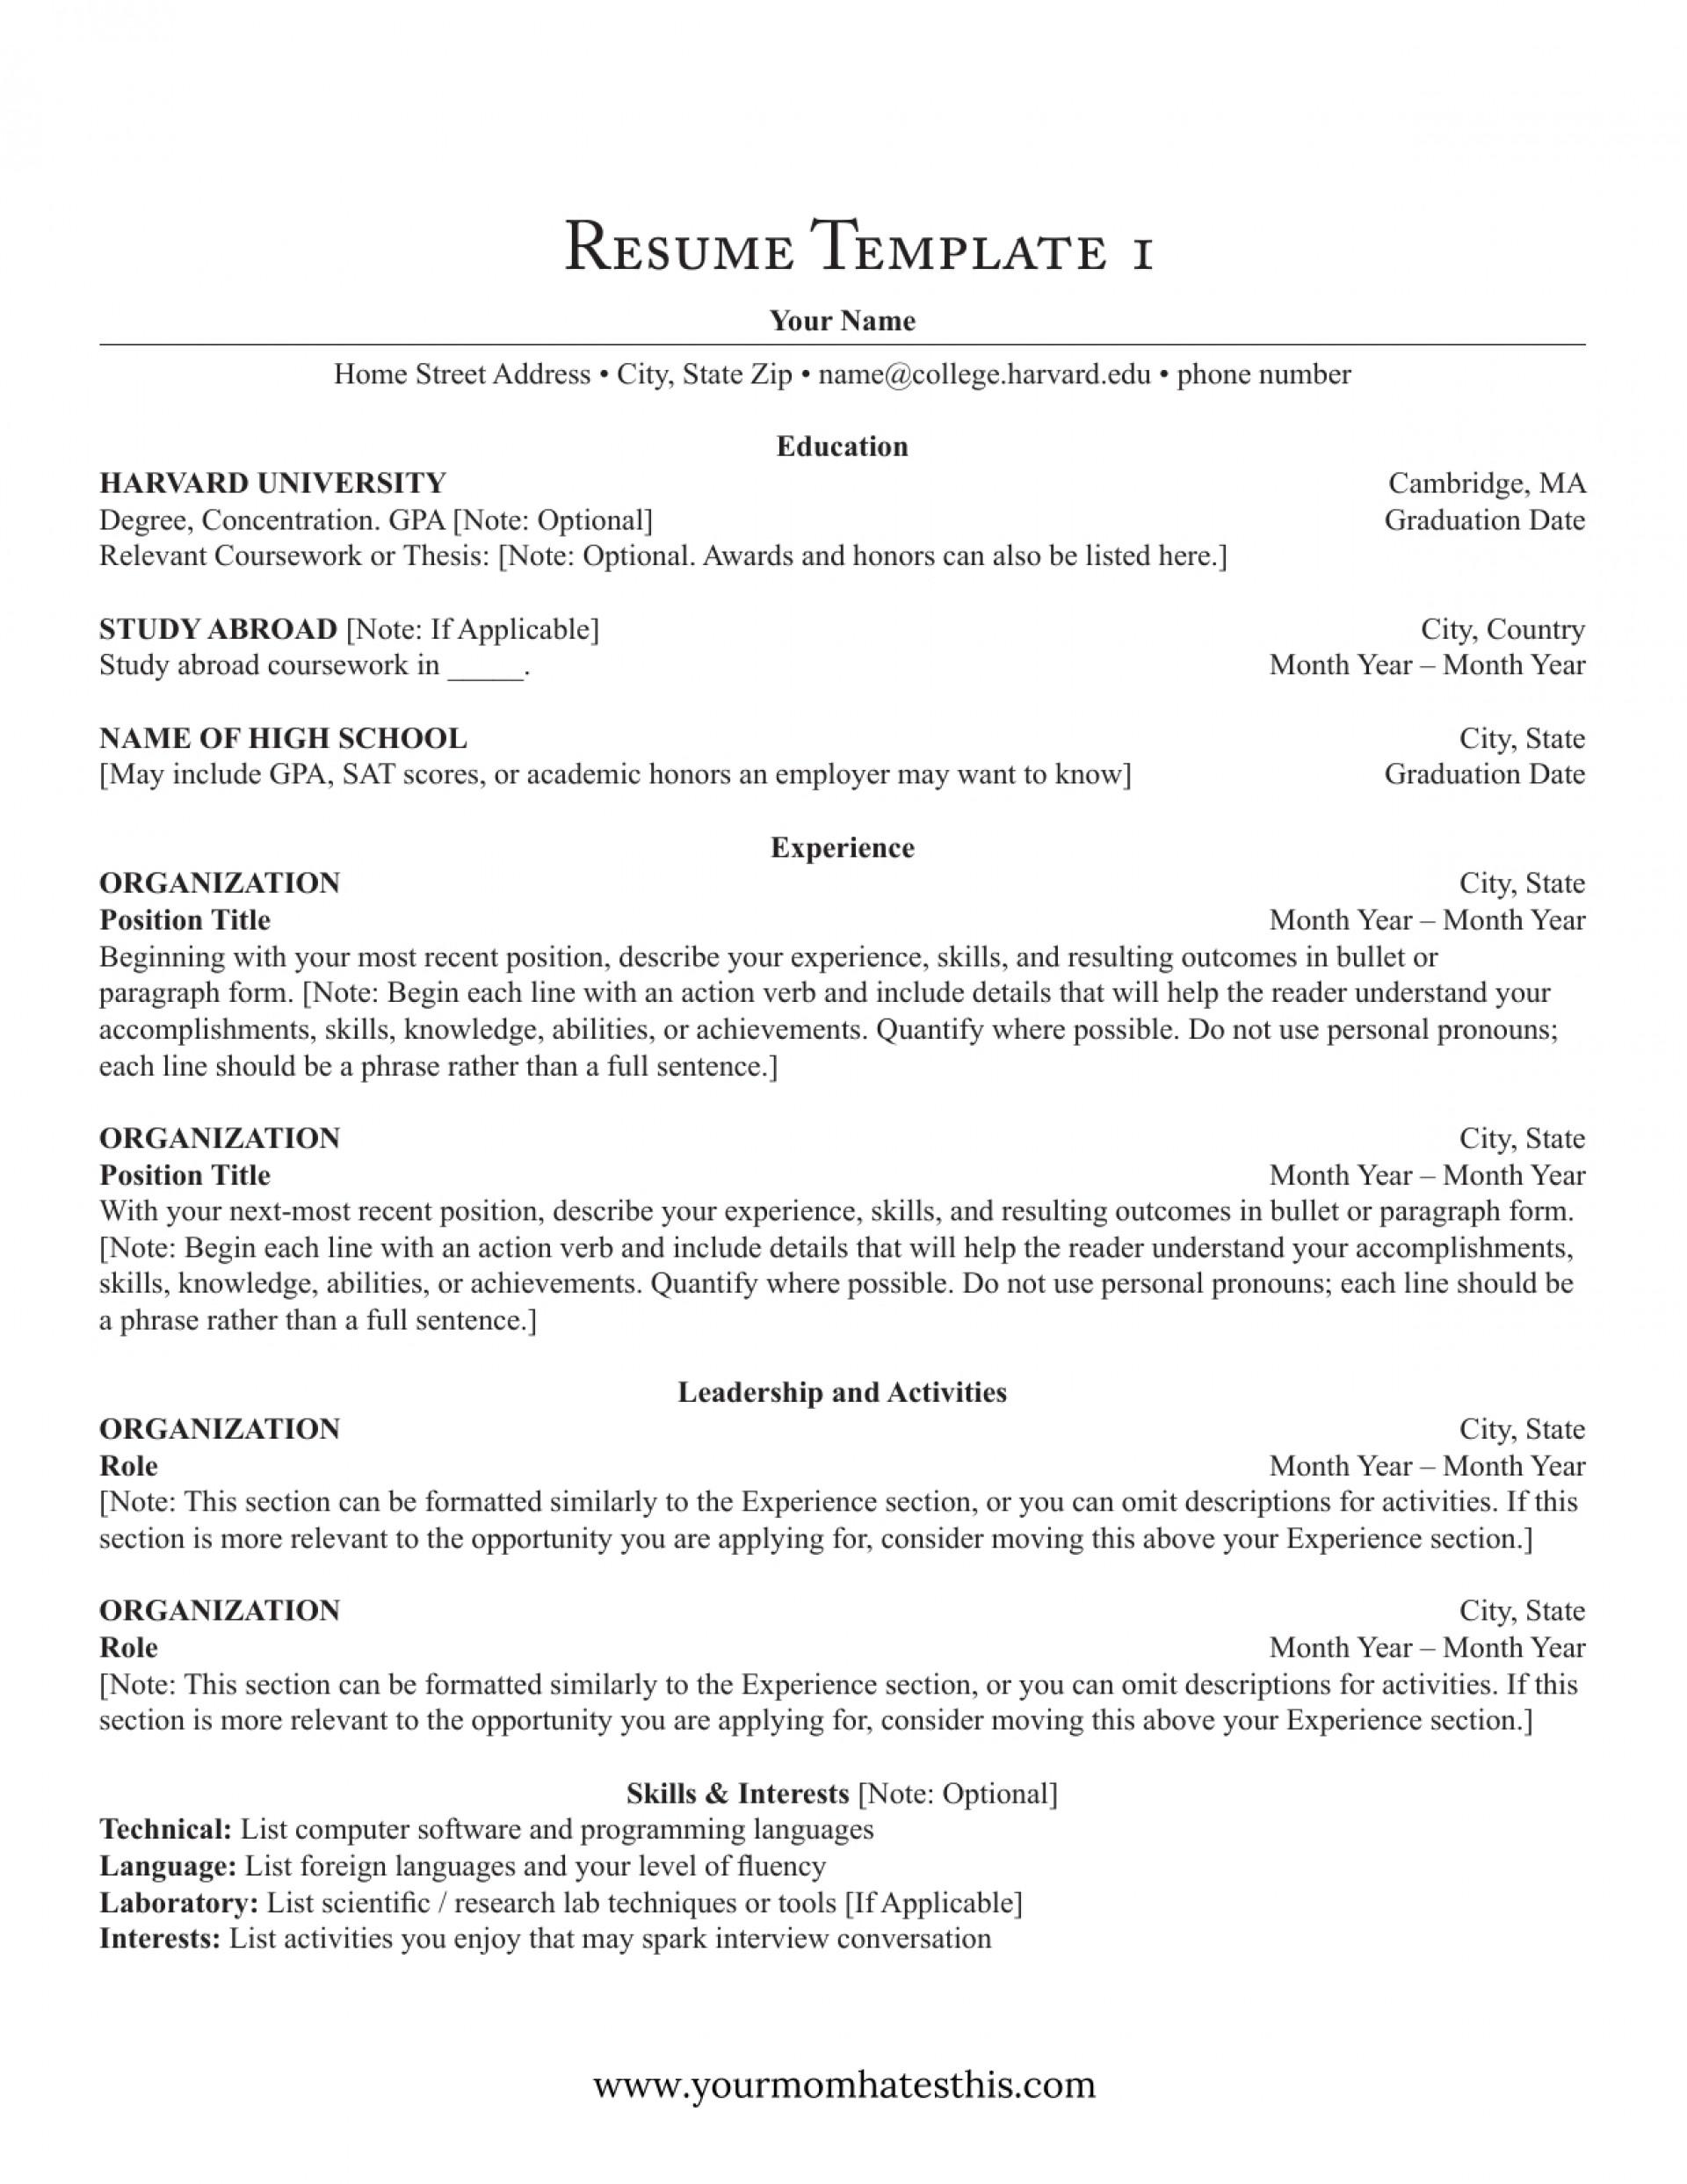 009 Modest Proposal Essay Exceptional Conclusion Topics Prompts 1920